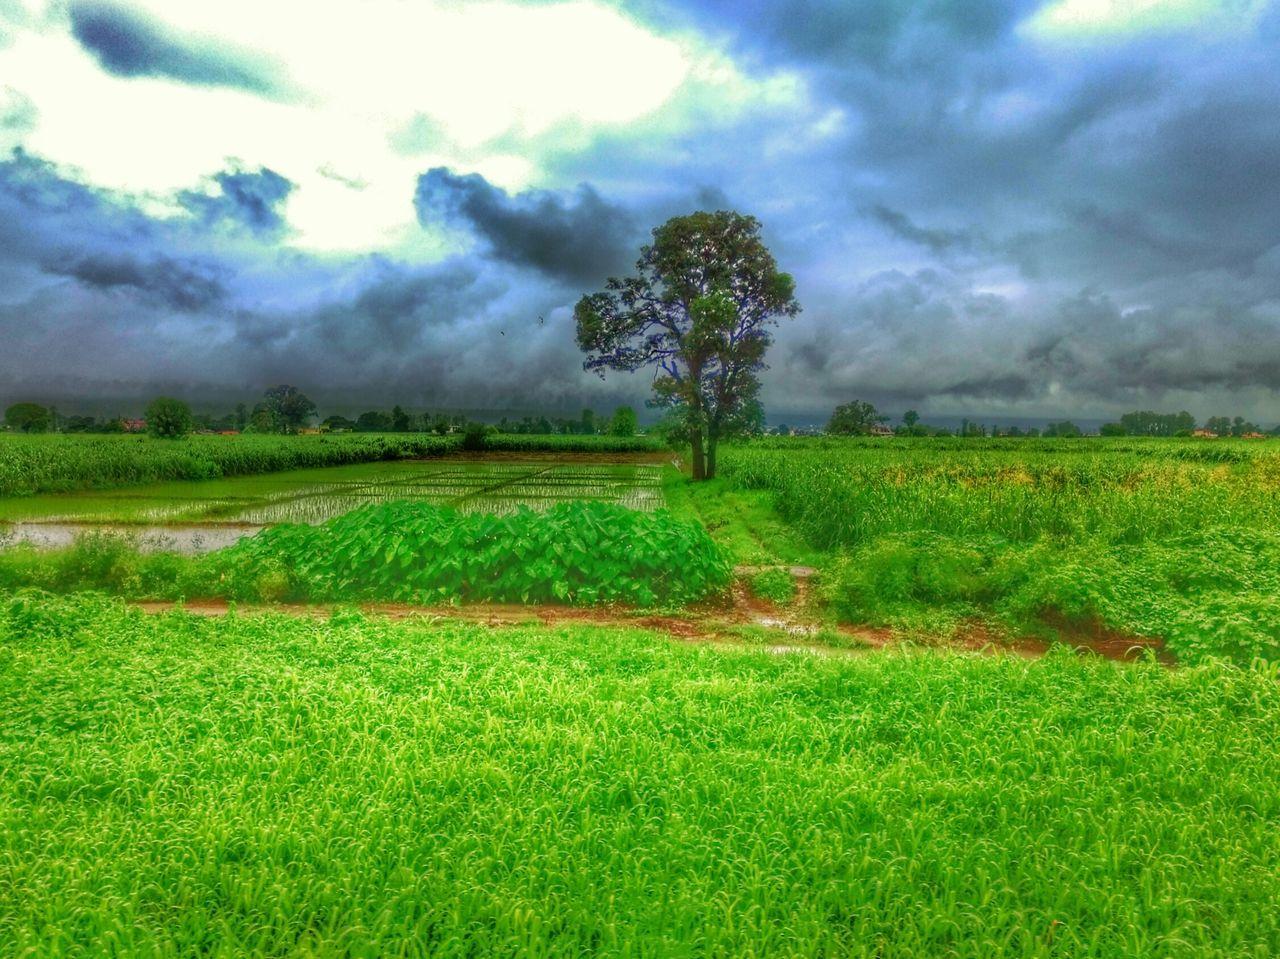 Railroad Track Rainy Days☔ Cloudsporn Dehardun Train Landscape_photography